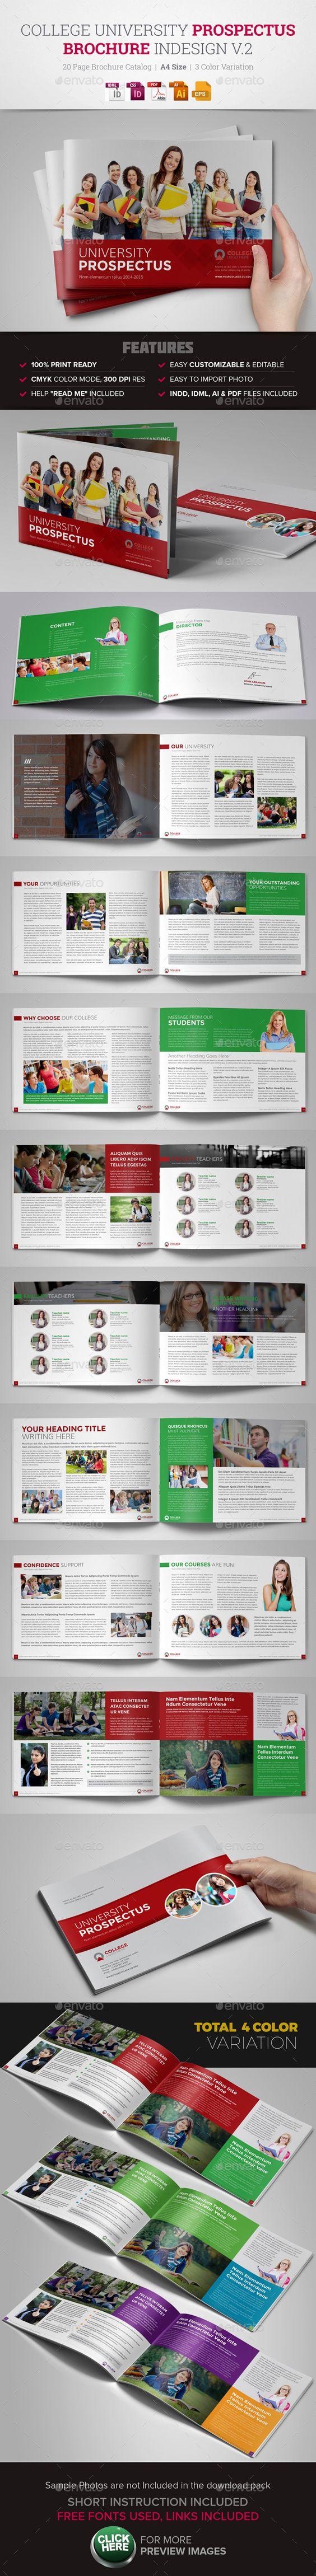 College University Prospectus Brochure v2 – University Brochure Template